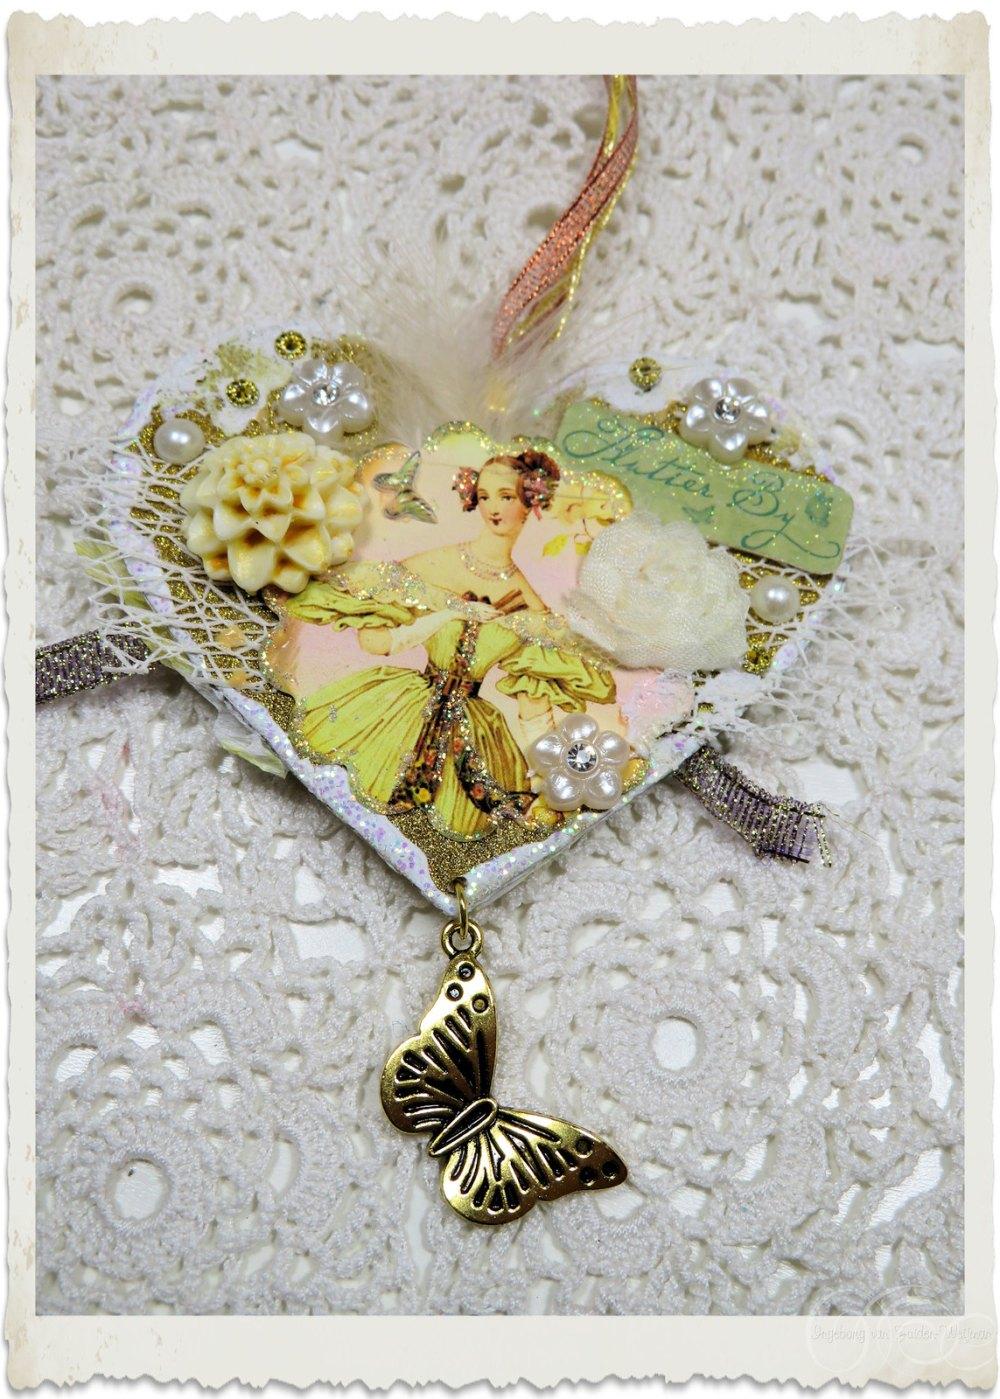 Handmade paper heart hanger by Ingeborg van Zuiden - my fairy beautiful world